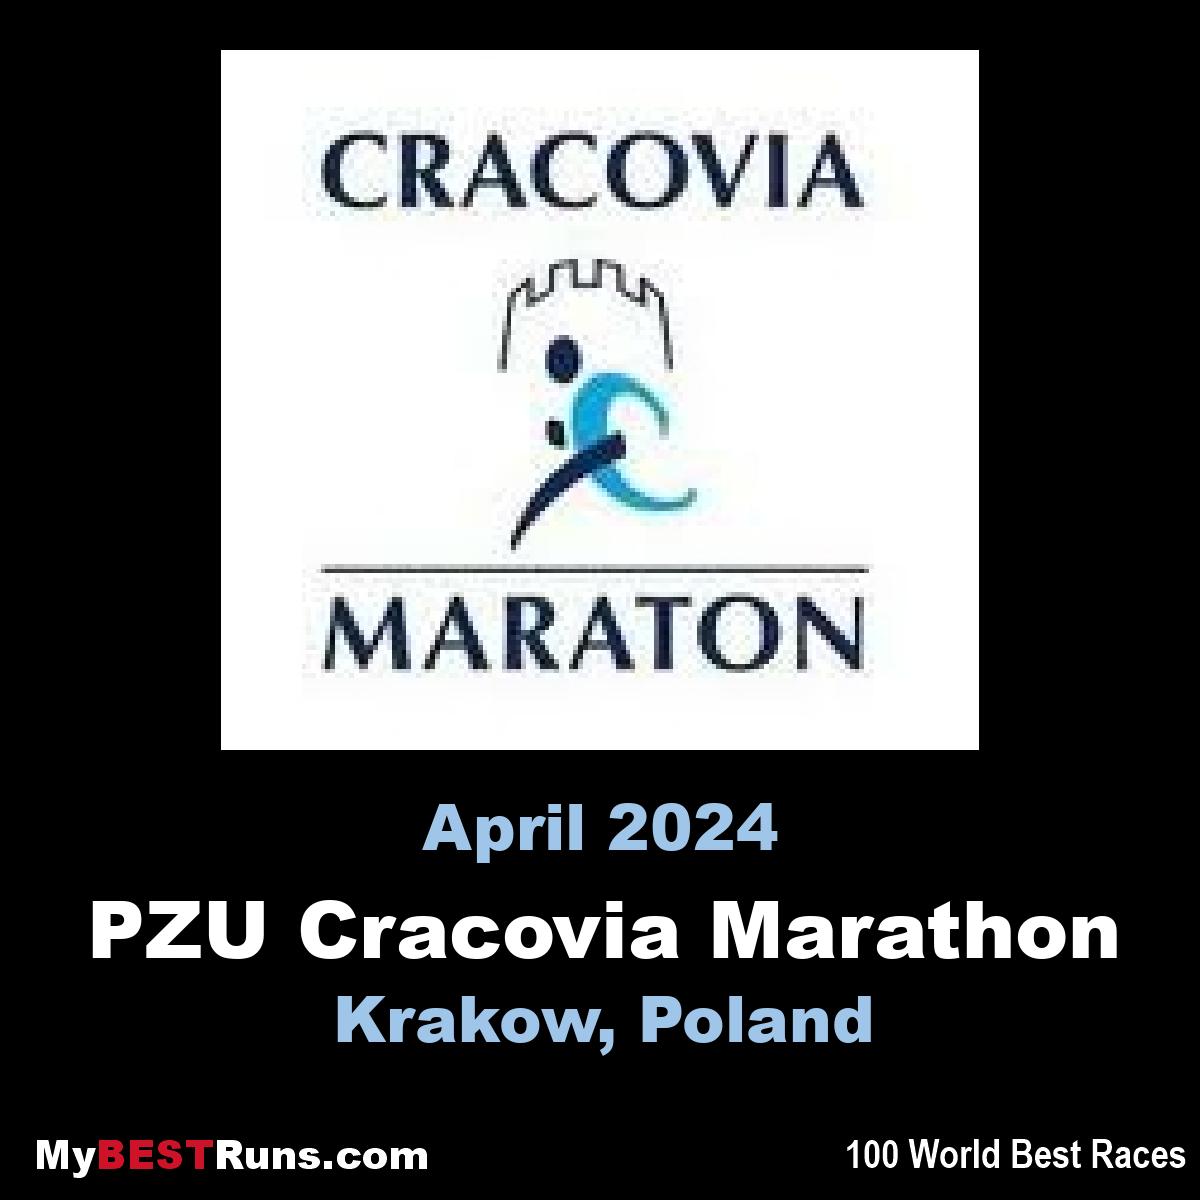 PZU Cracovia Marathon